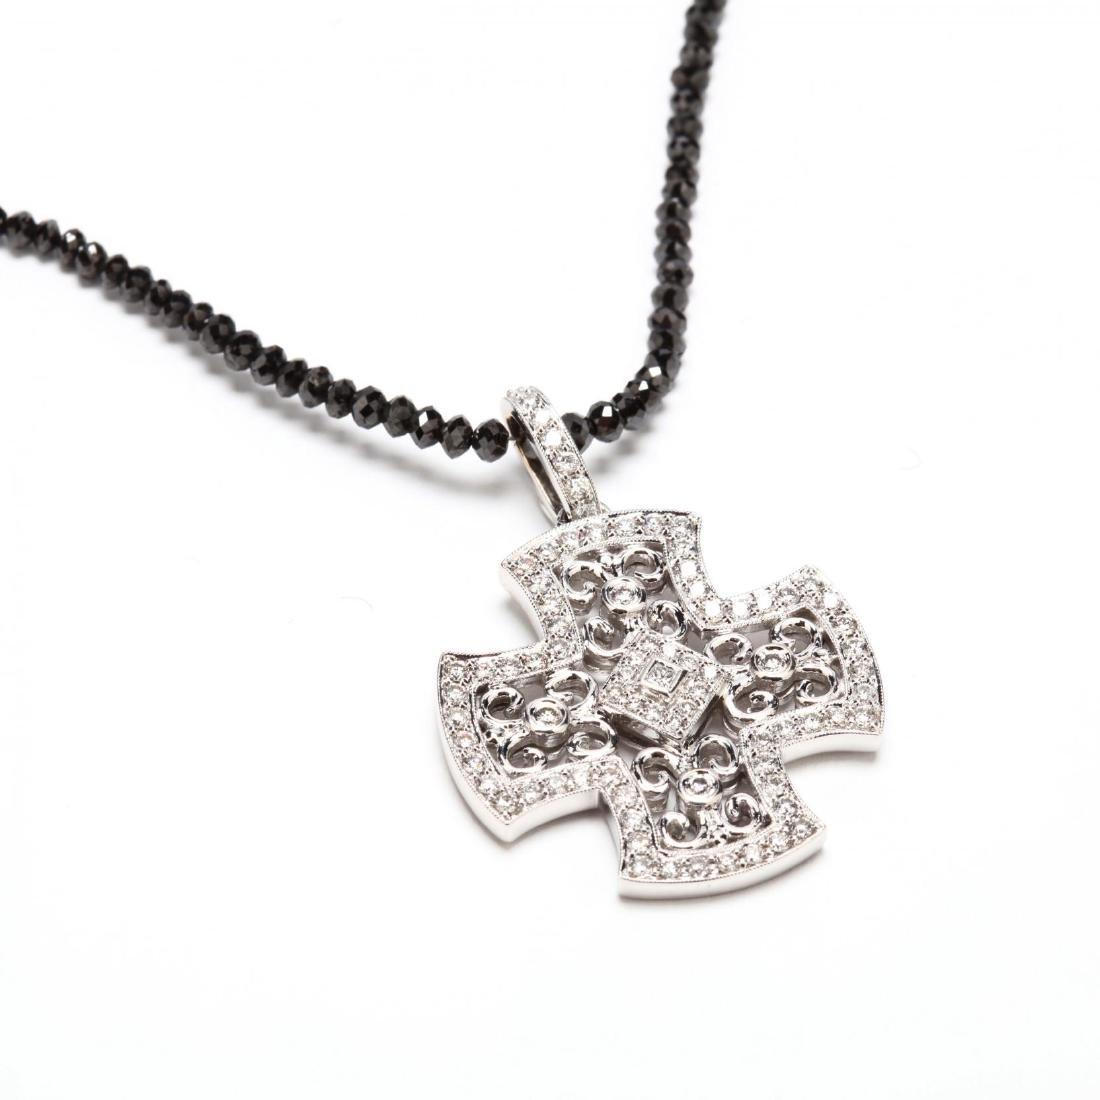 18KT Diamond Bead Necklace and Diamond Pendant